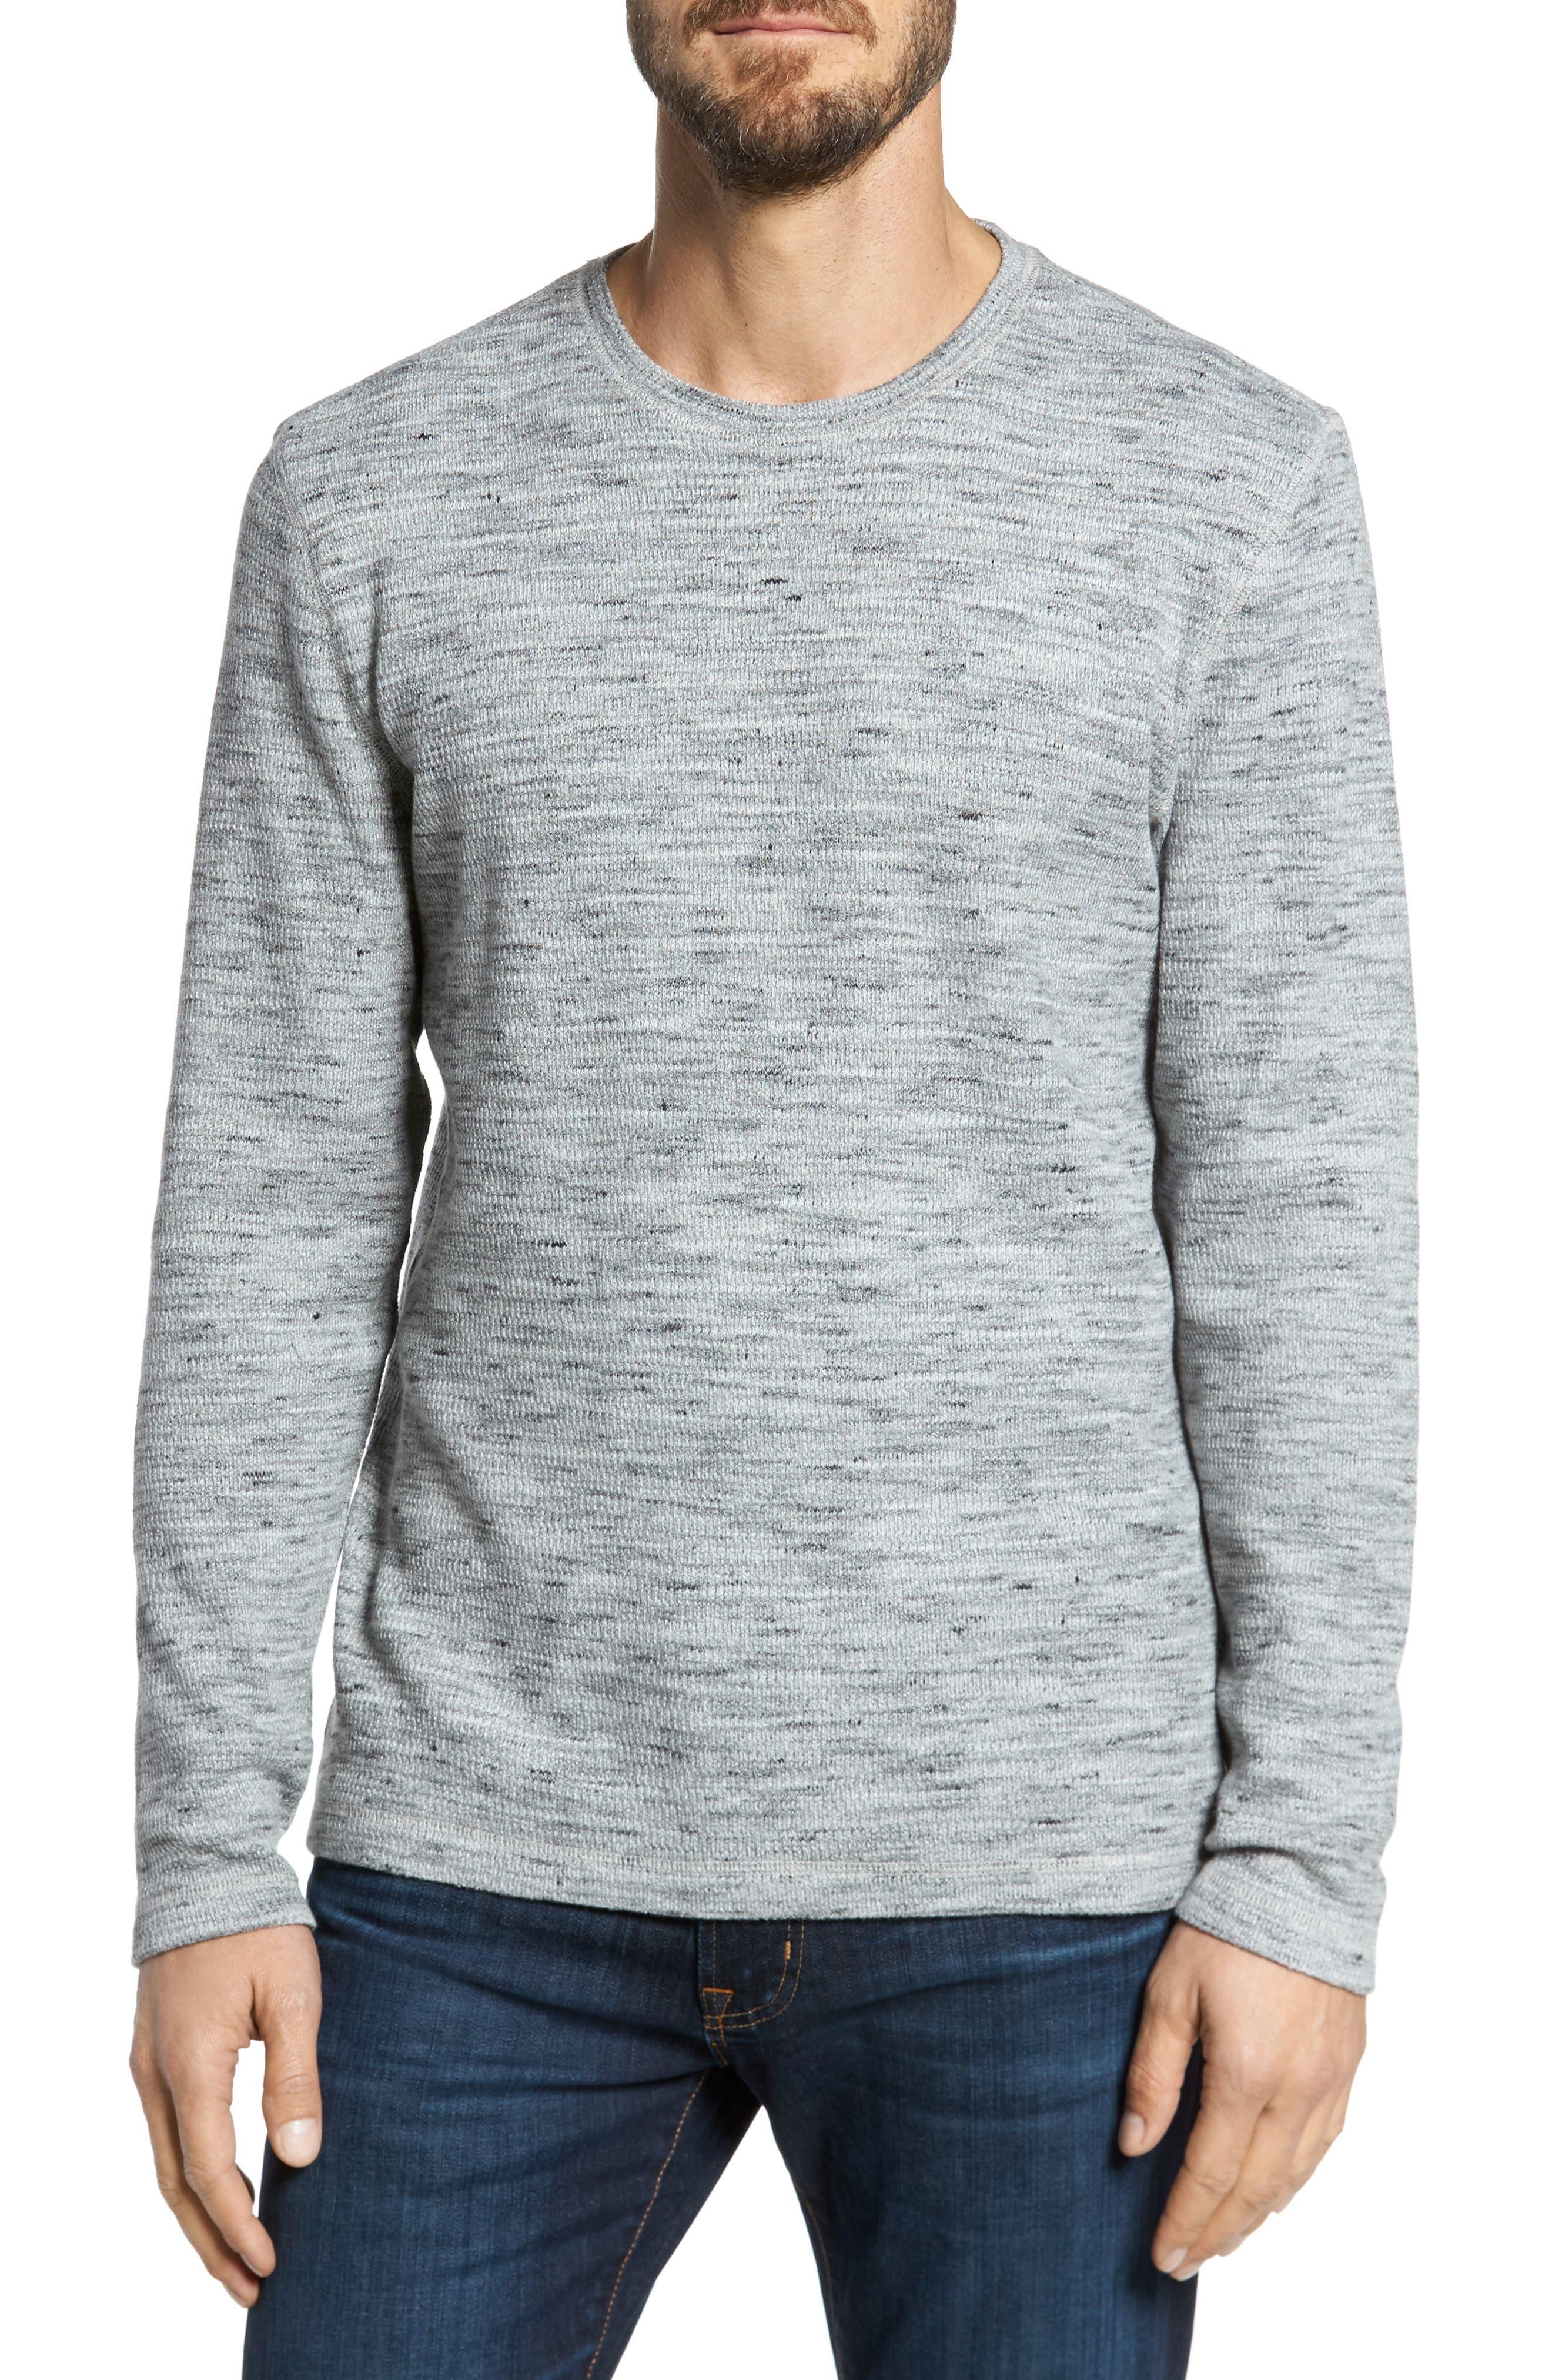 Nordstrom Men's Shop Waffle Knit Shirt